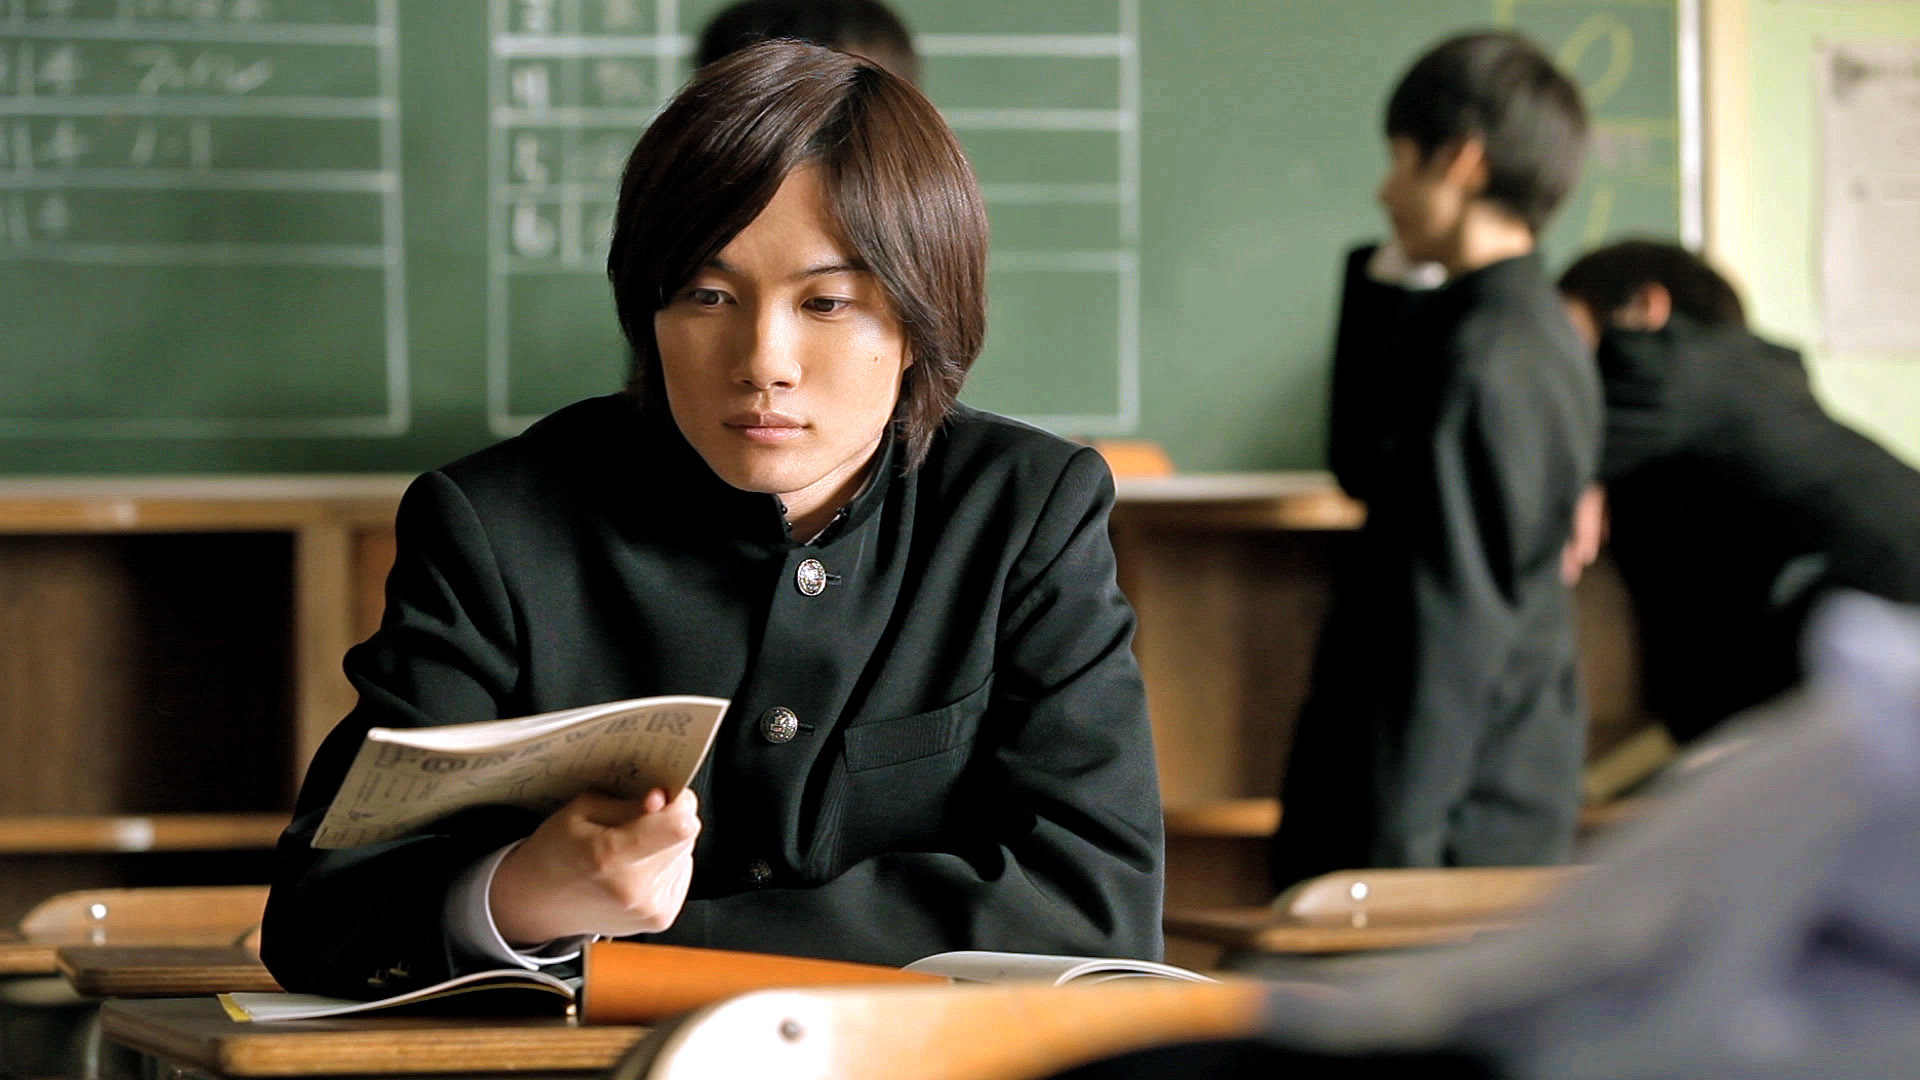 (C) 2017 Tales of CHIGASAKI film committee